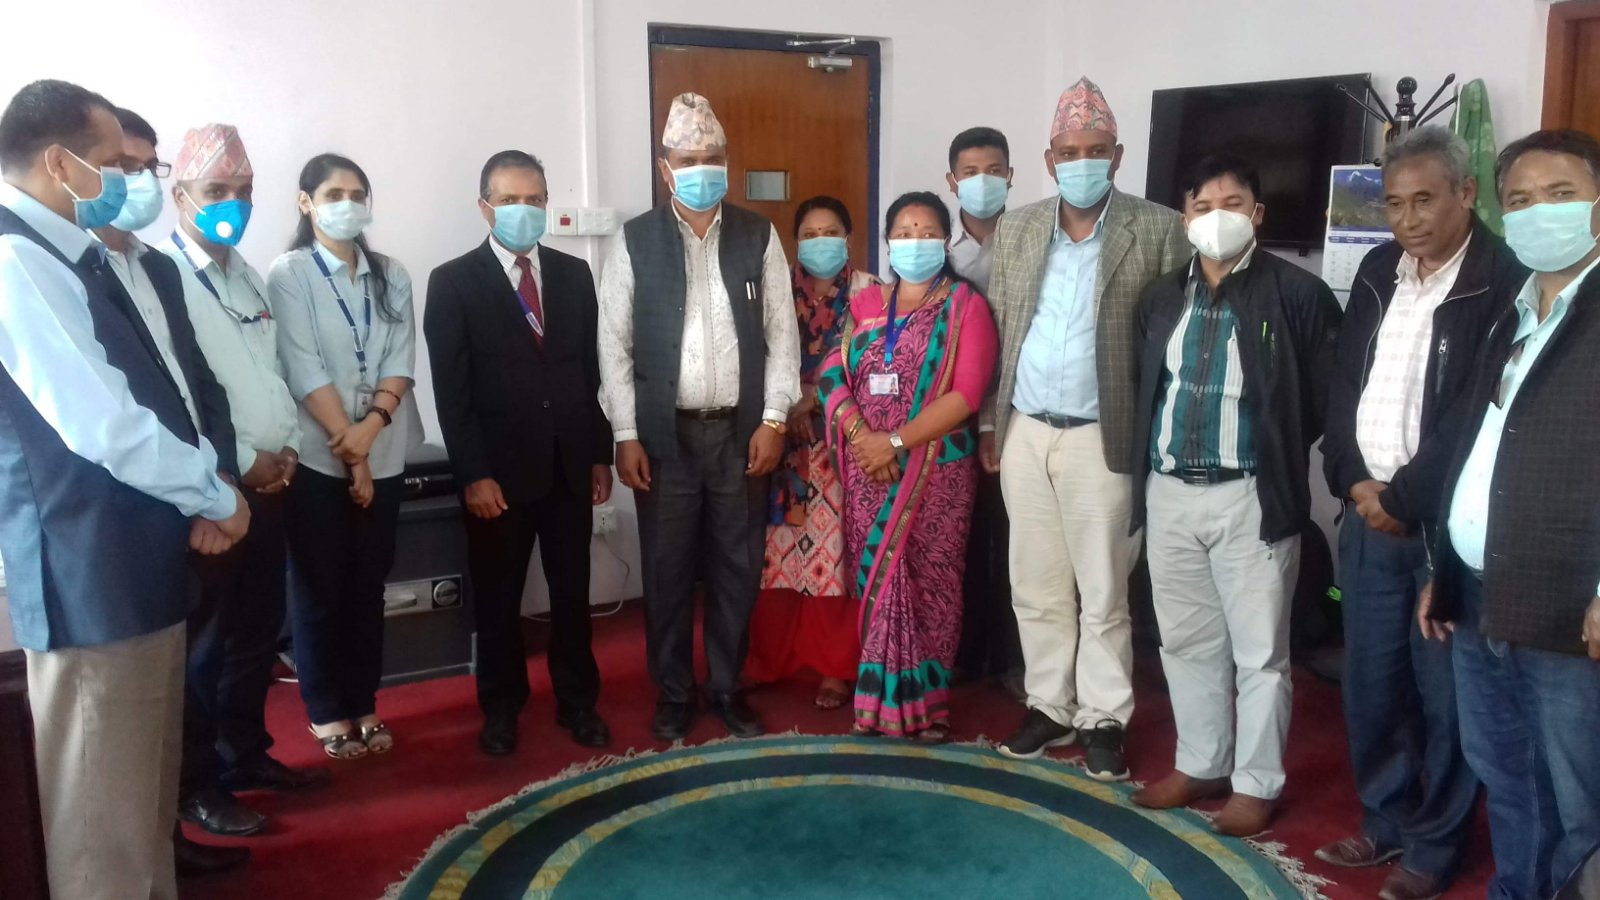 नेपाल बैंक लिमिटेड तथा लिसंखु पाखर गाउँपालिका बिच सम्झौता